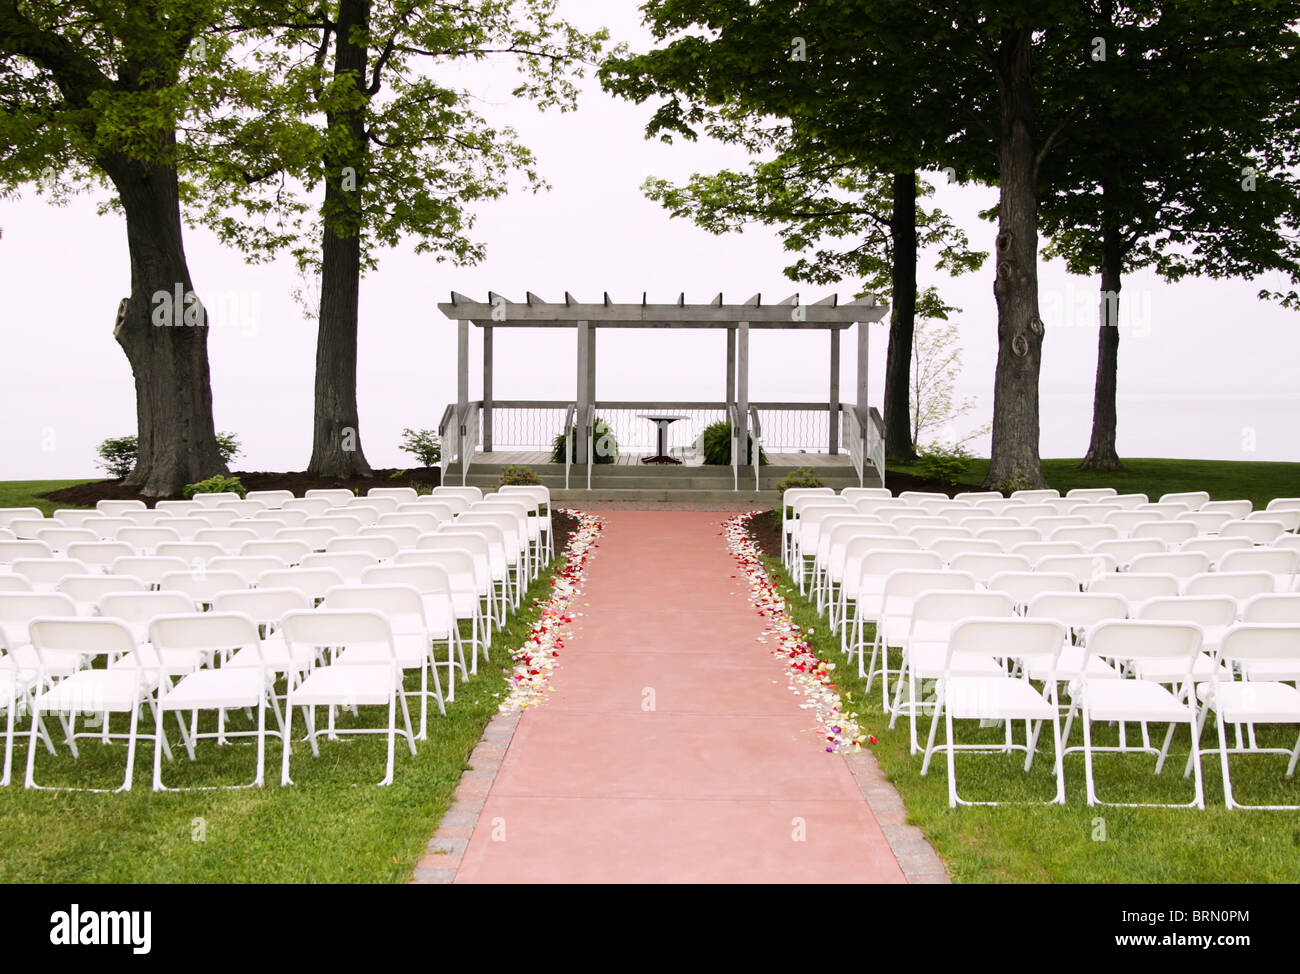 Wedding ceremony chair - Stock Photo White Folding Chairs Setup For A Wedding Ceremony